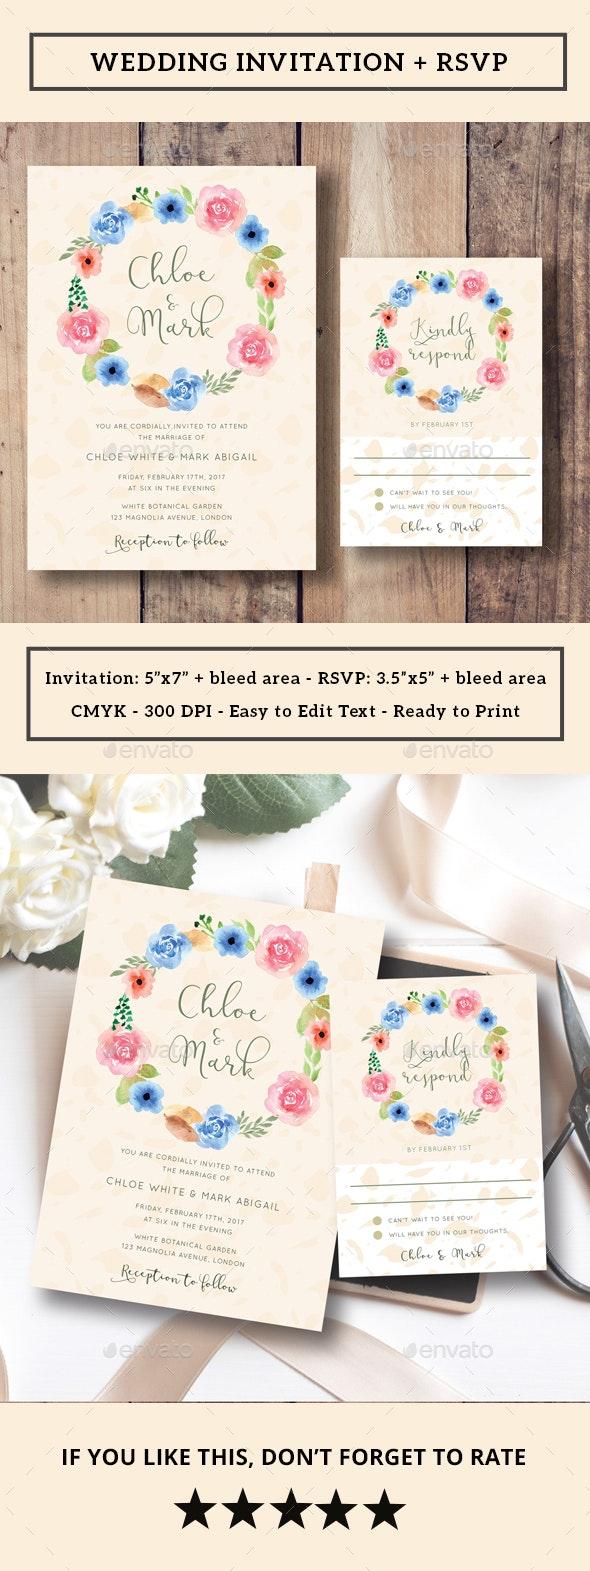 Floral Wreath Wedding Invitation + RSVP - Weddings Cards & Invites